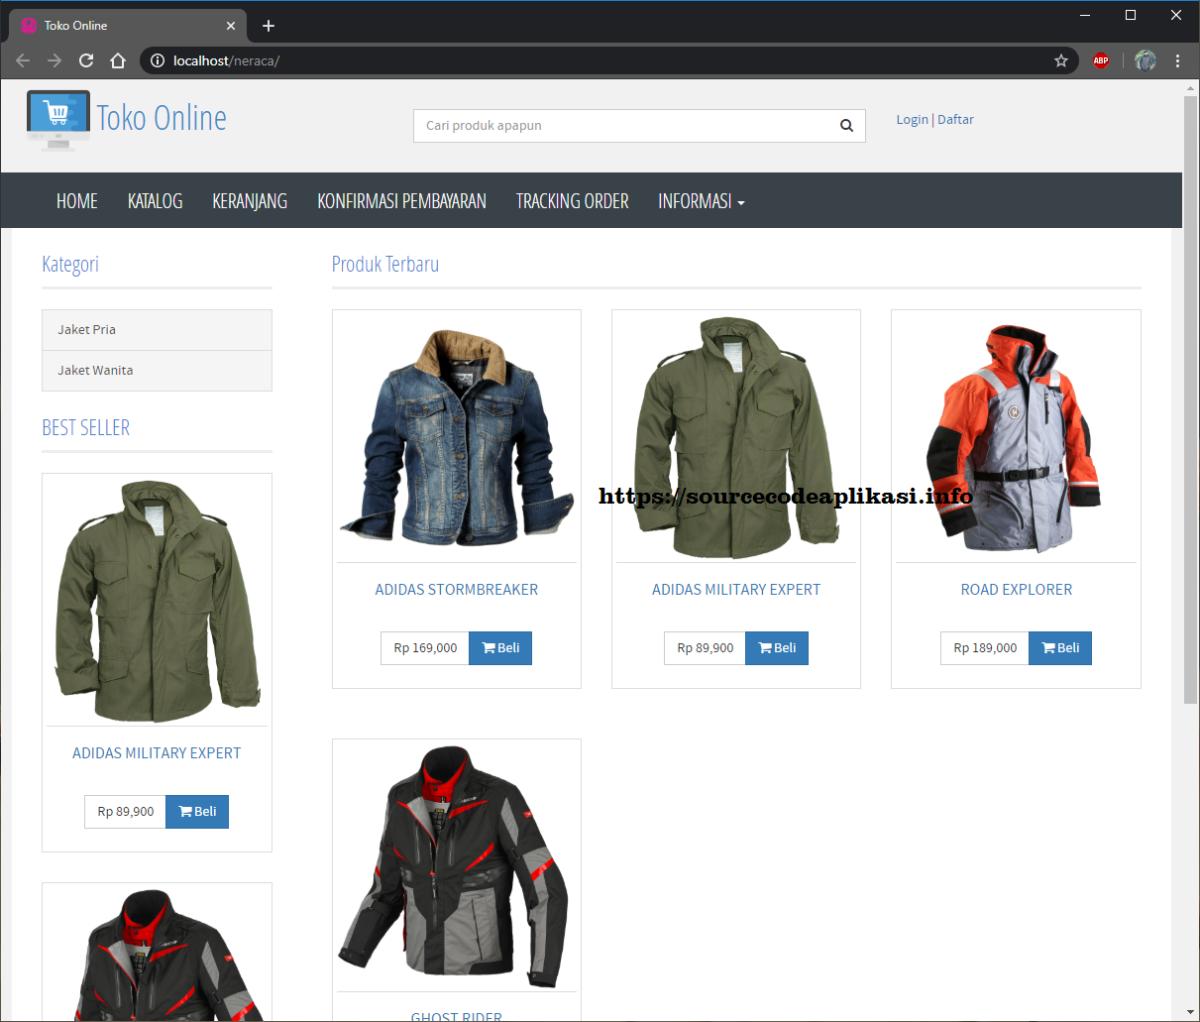 aplikasi toko online 1 - Source Code Aplikasi Toko Online Berbasis Codeigniter